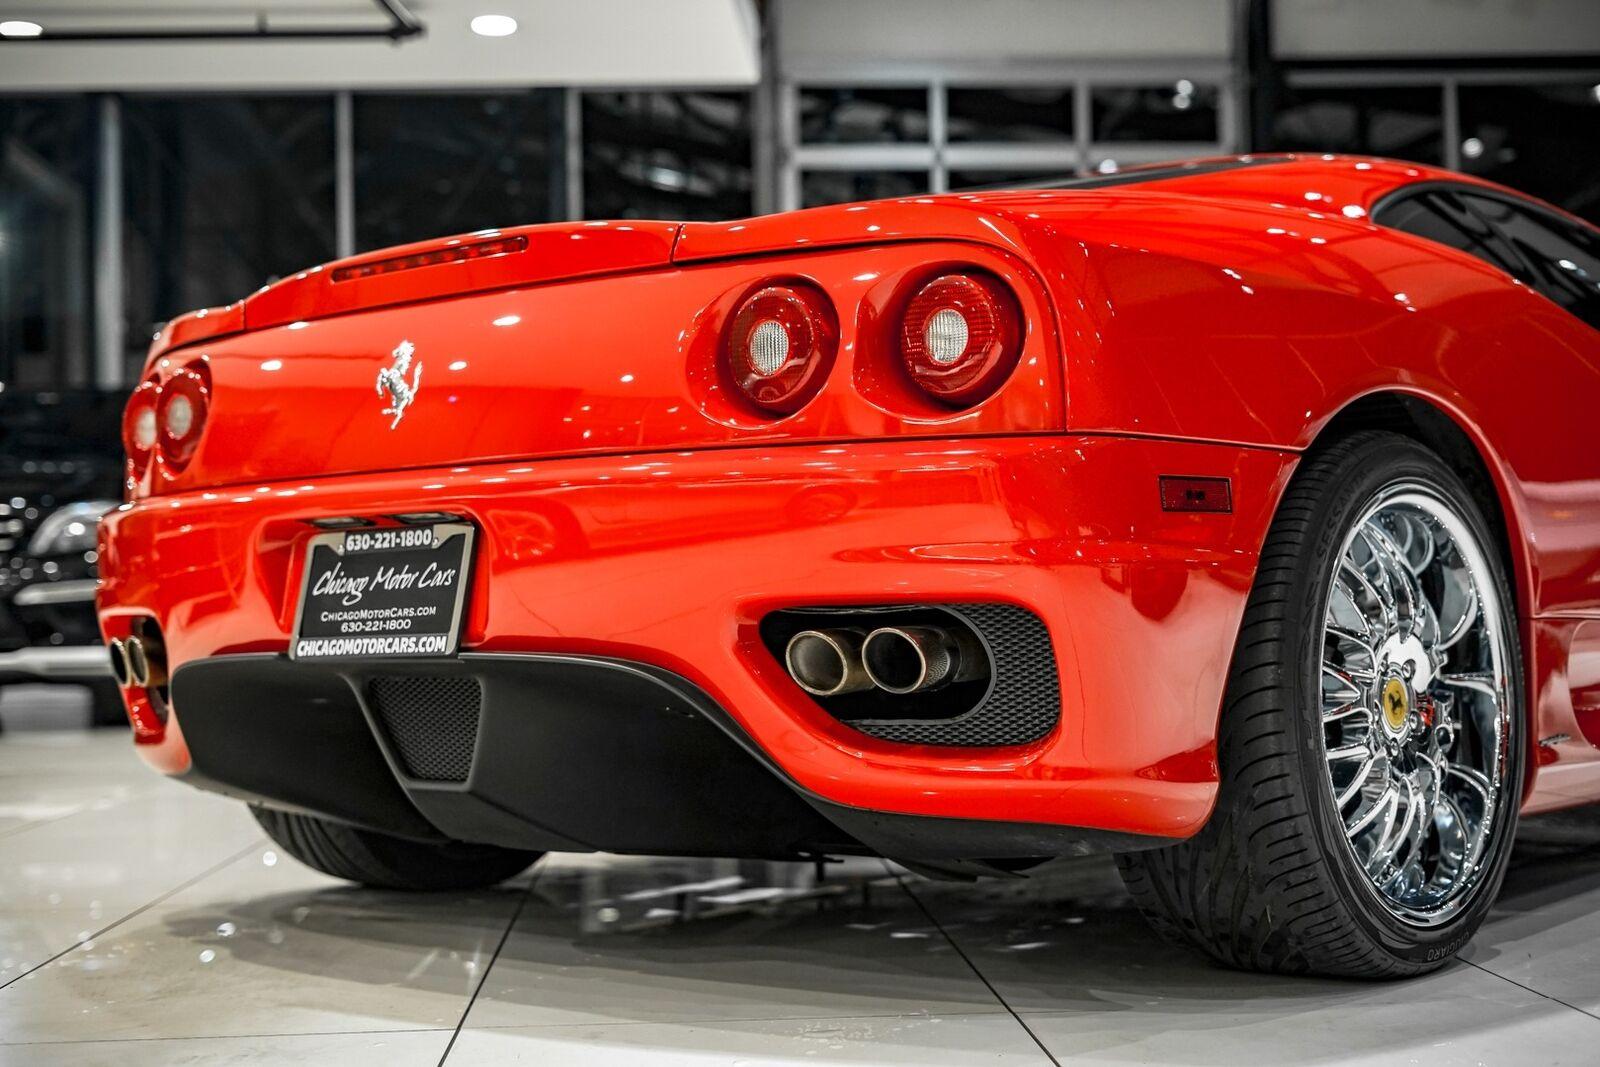 1999 Ferrari 360 F1 TRANSMISSION! SERVICE RECORDS! | eBay